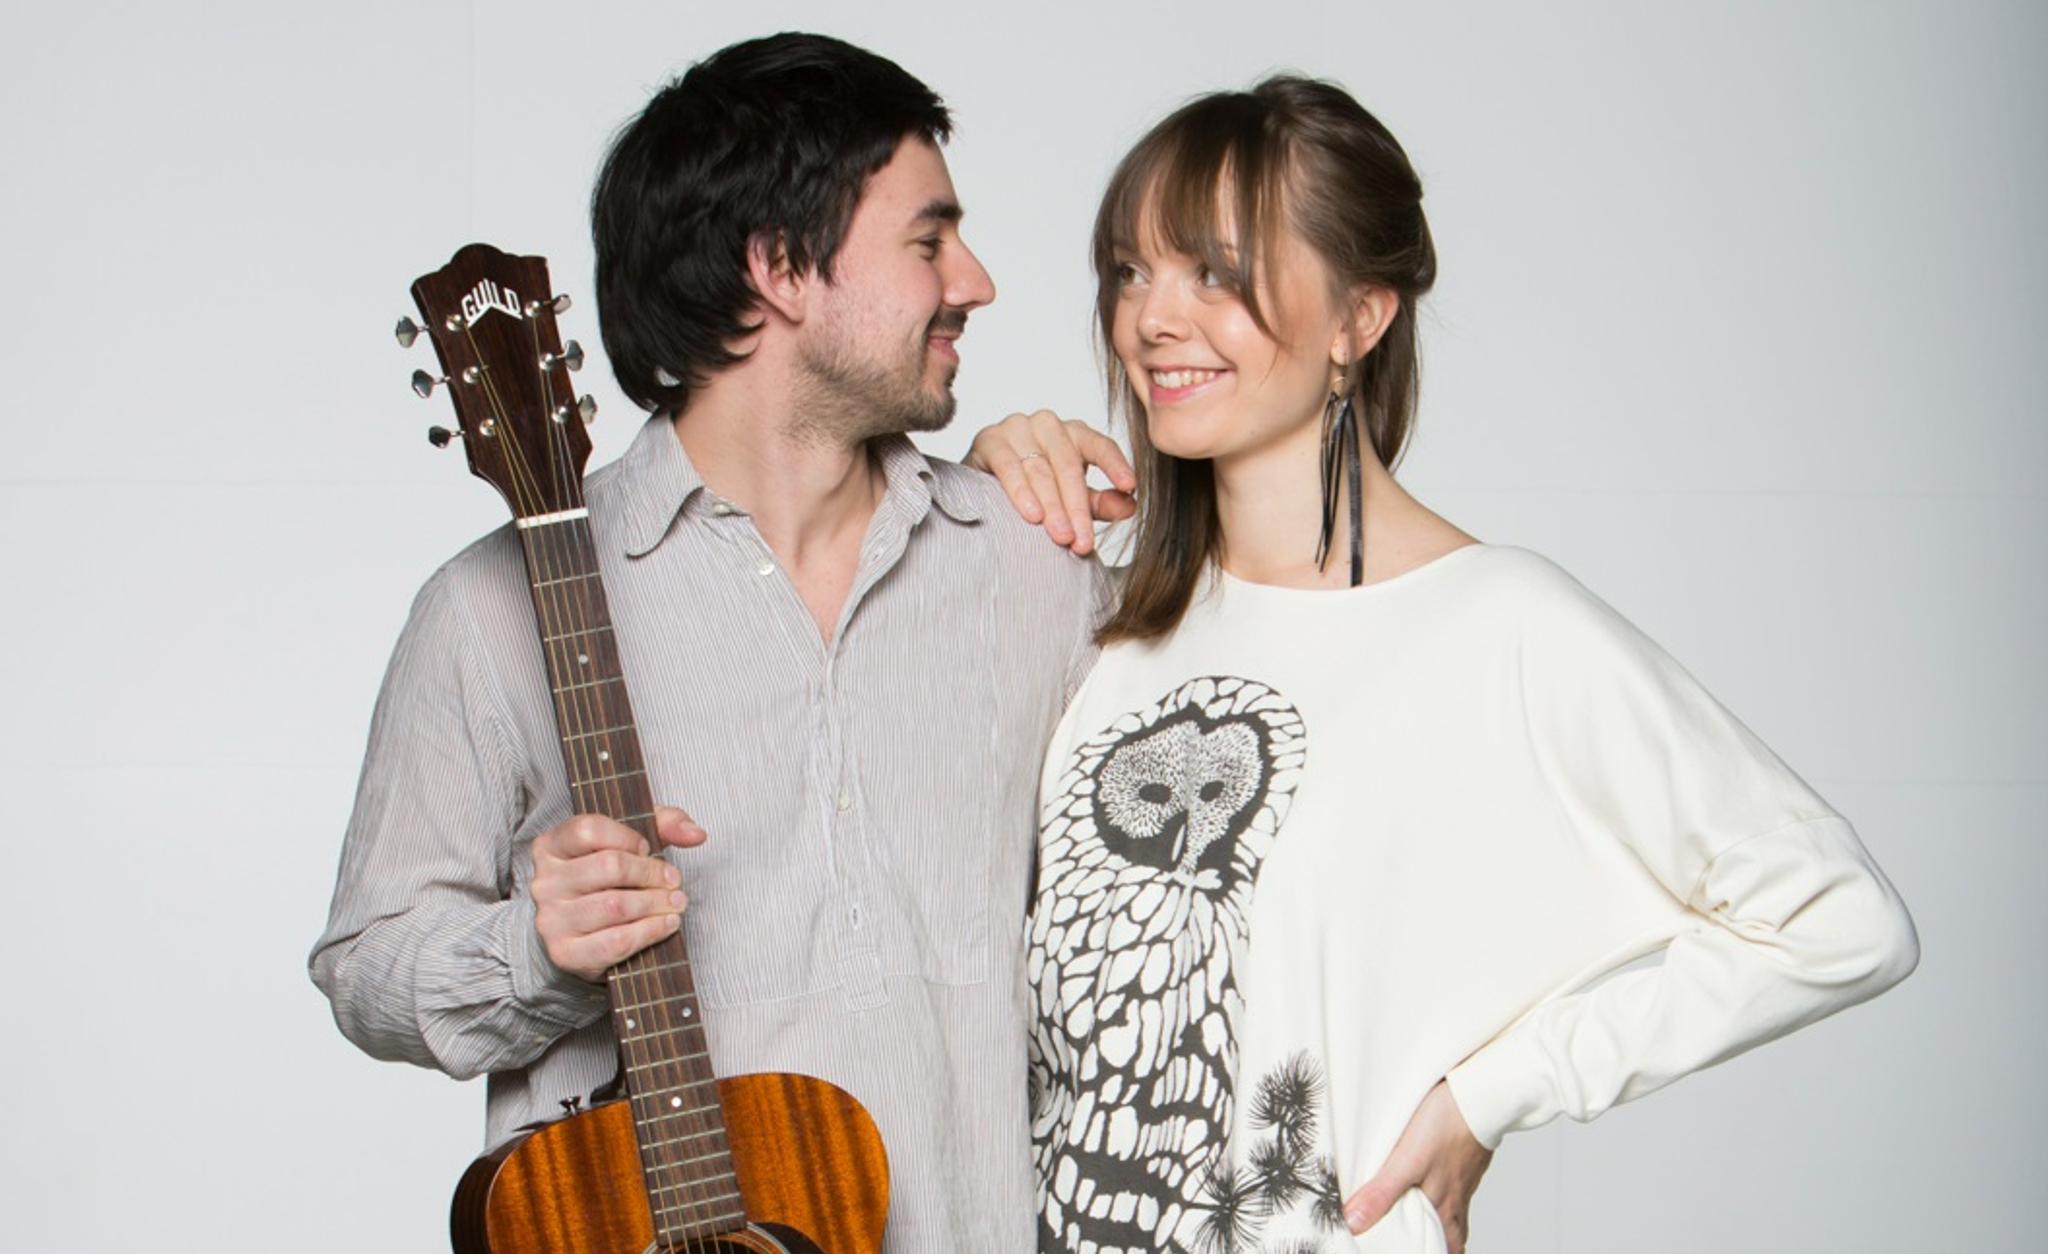 säännöt dating muusikkodating Coleman uunissa